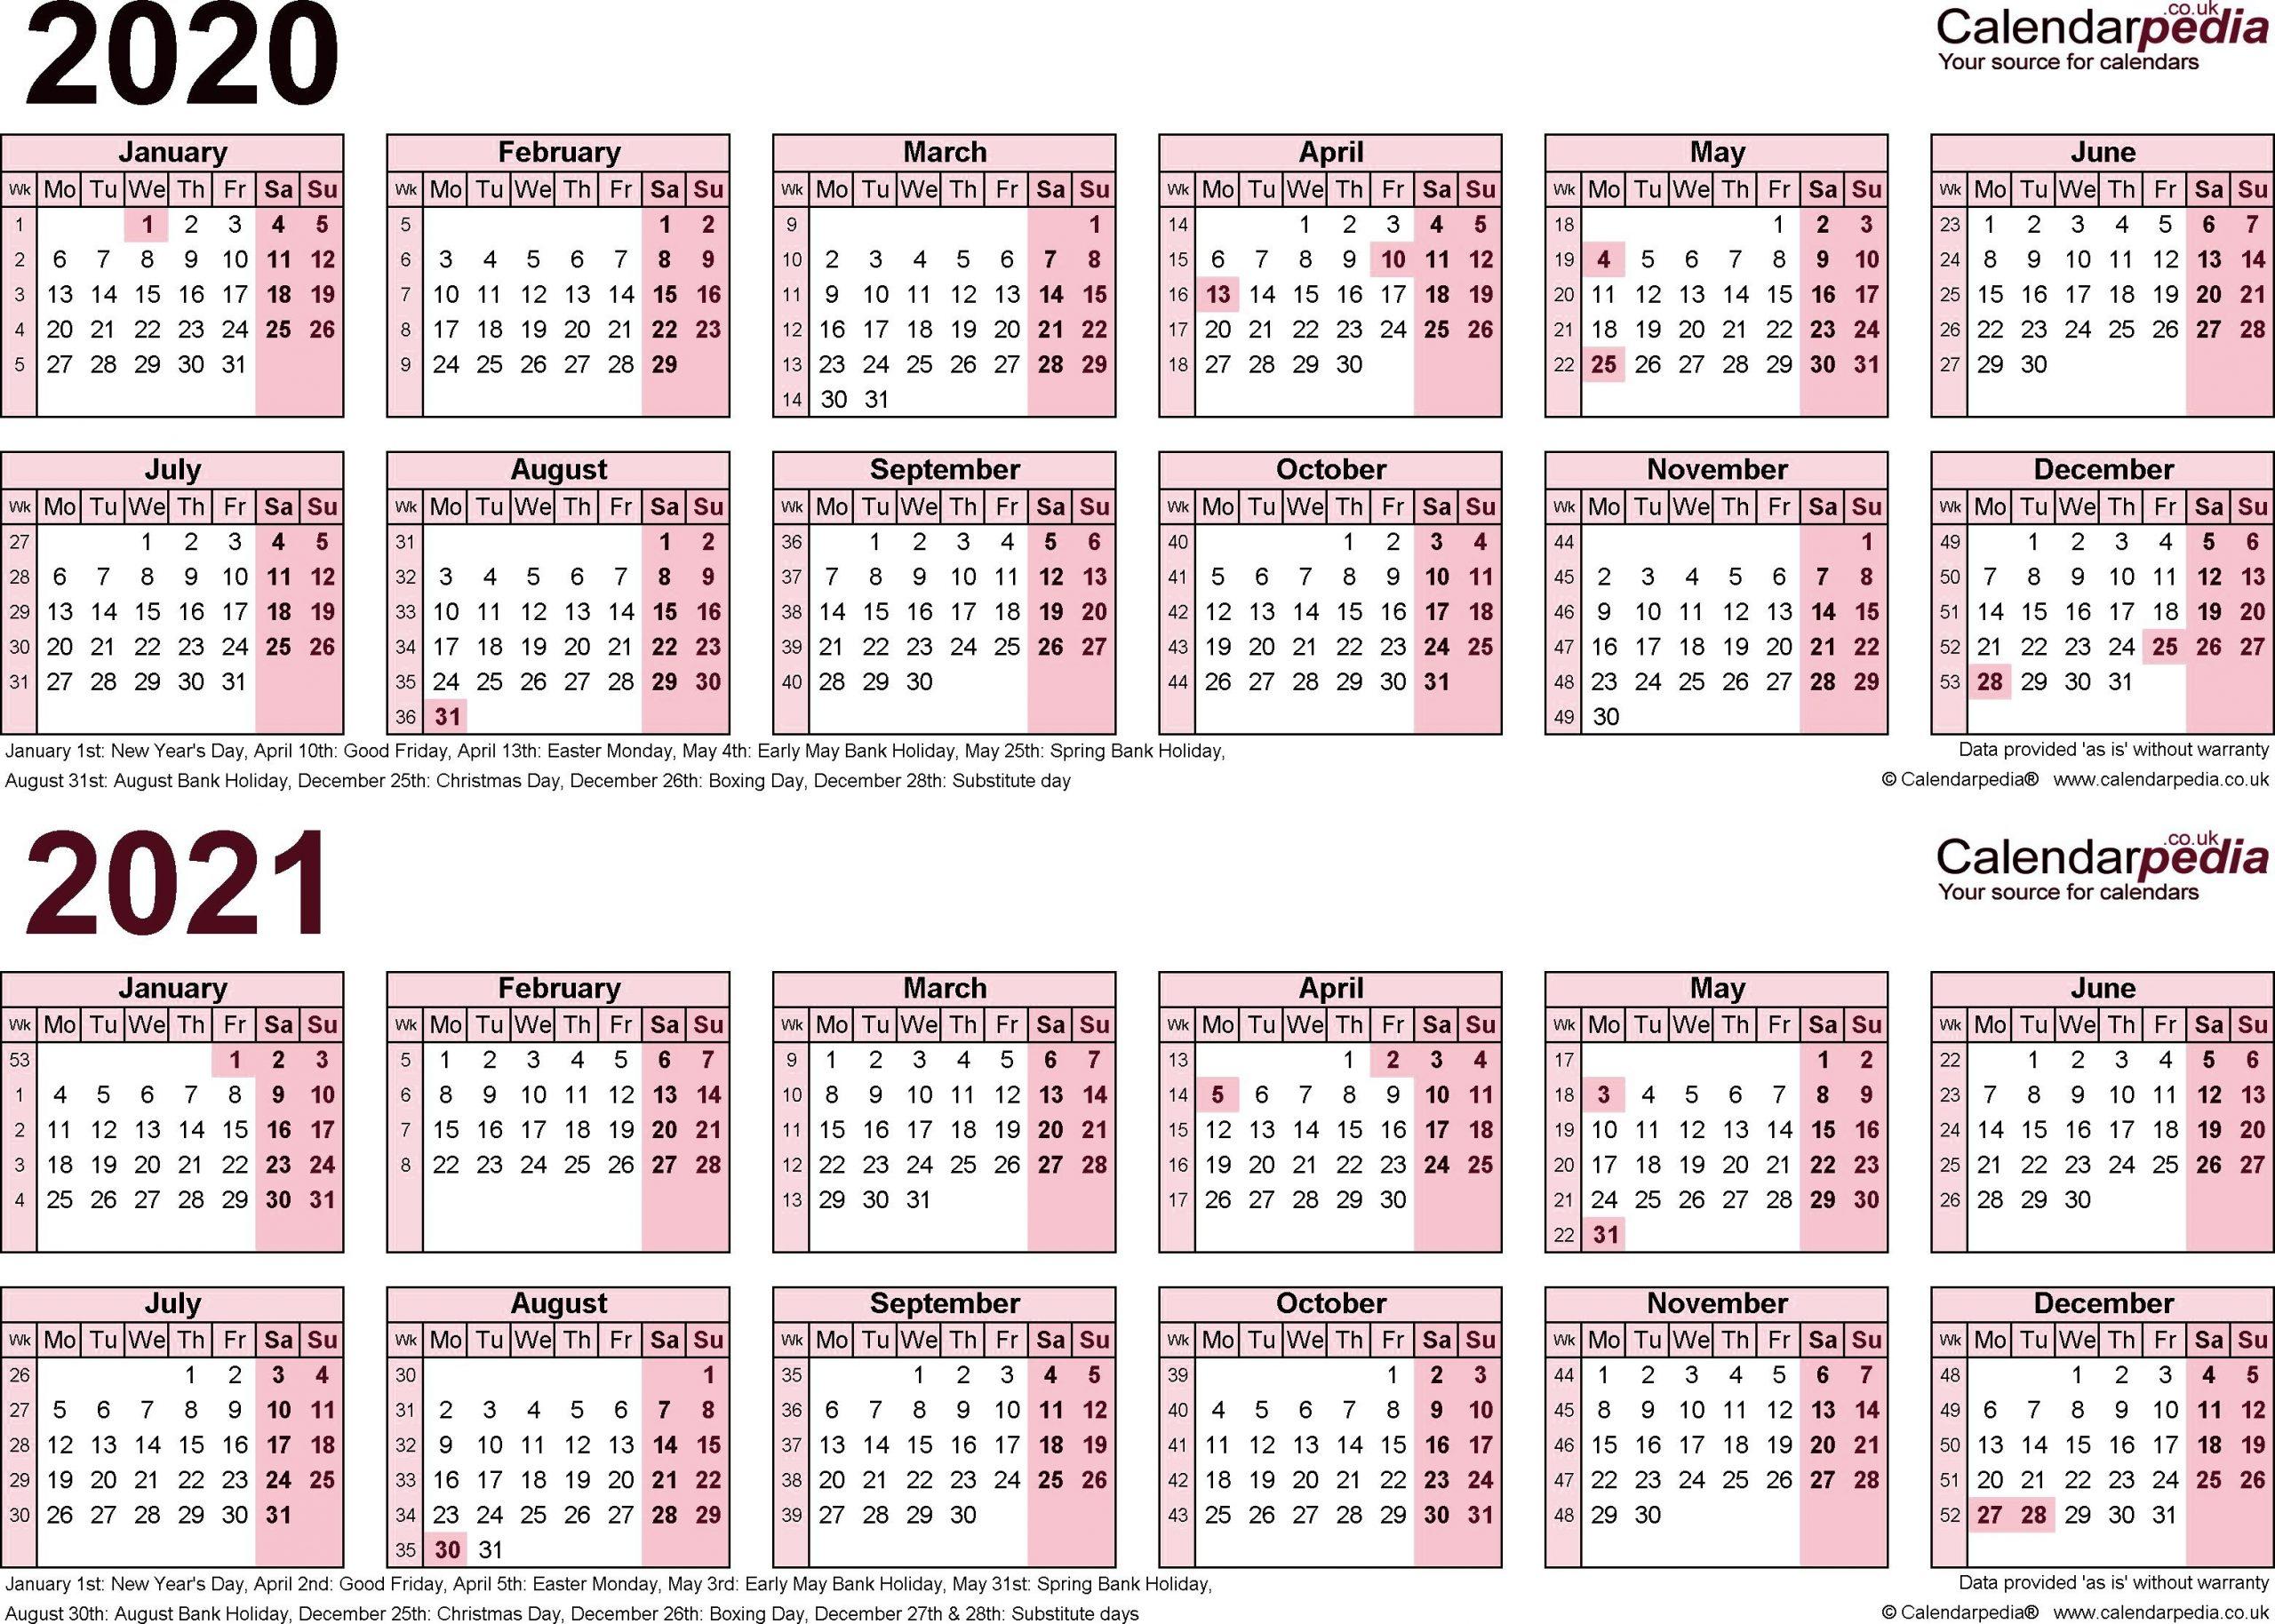 Payroll Calendar Template 2020 ~ Addictionary